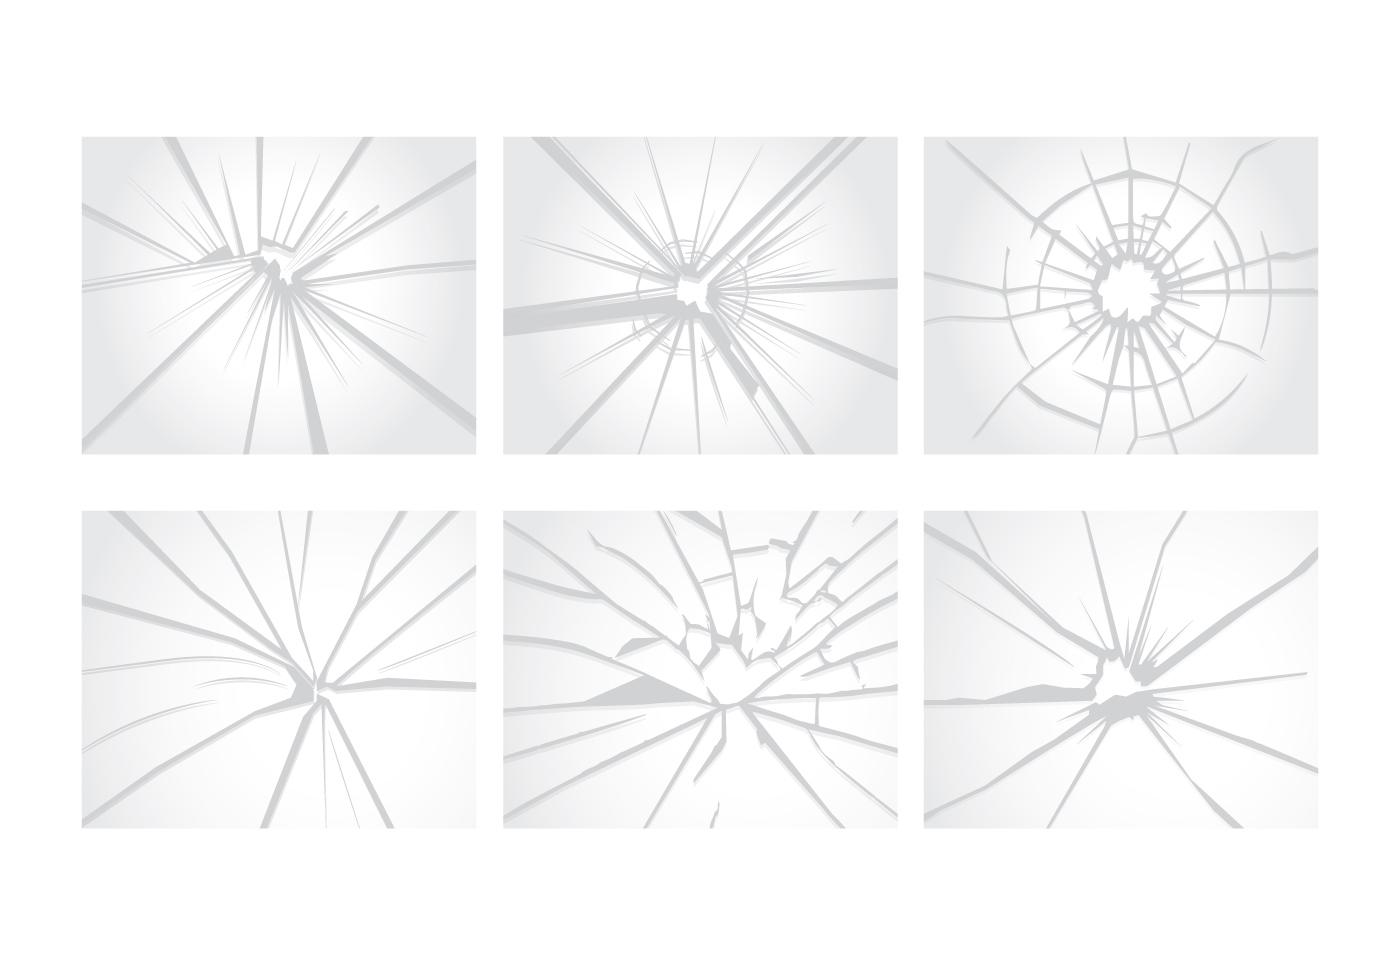 Cracked Glass Vectors